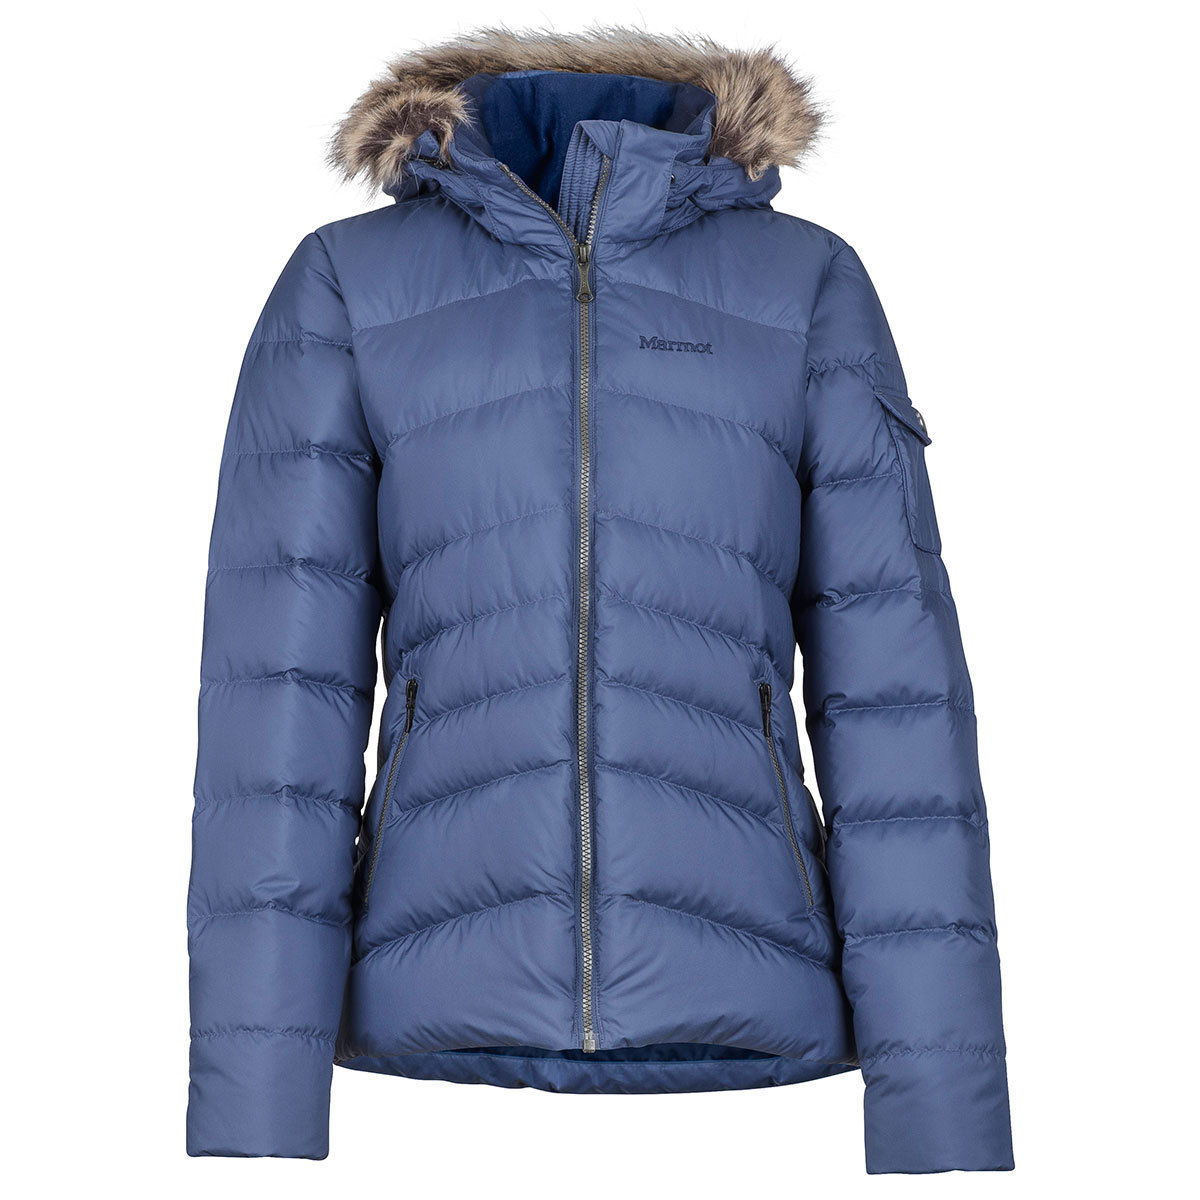 Marmot Woman's Ithaca Jacket - Blue, S